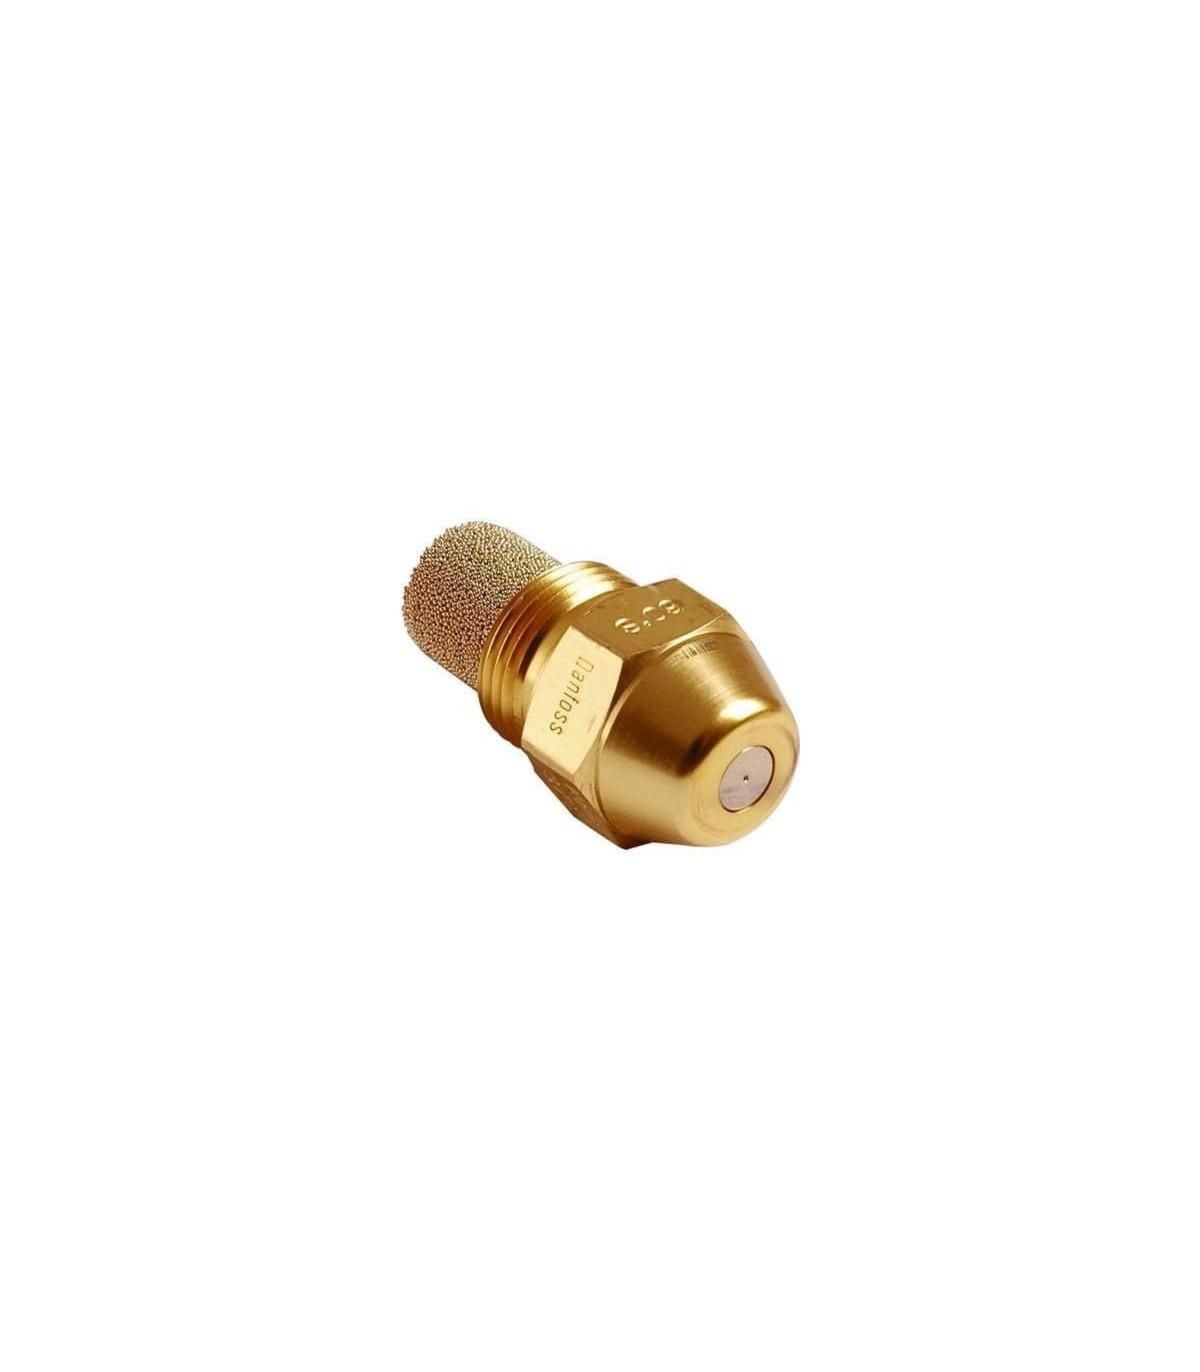 030f8914 Danfoss boquilla quemador aceite 0,65//80 ° S